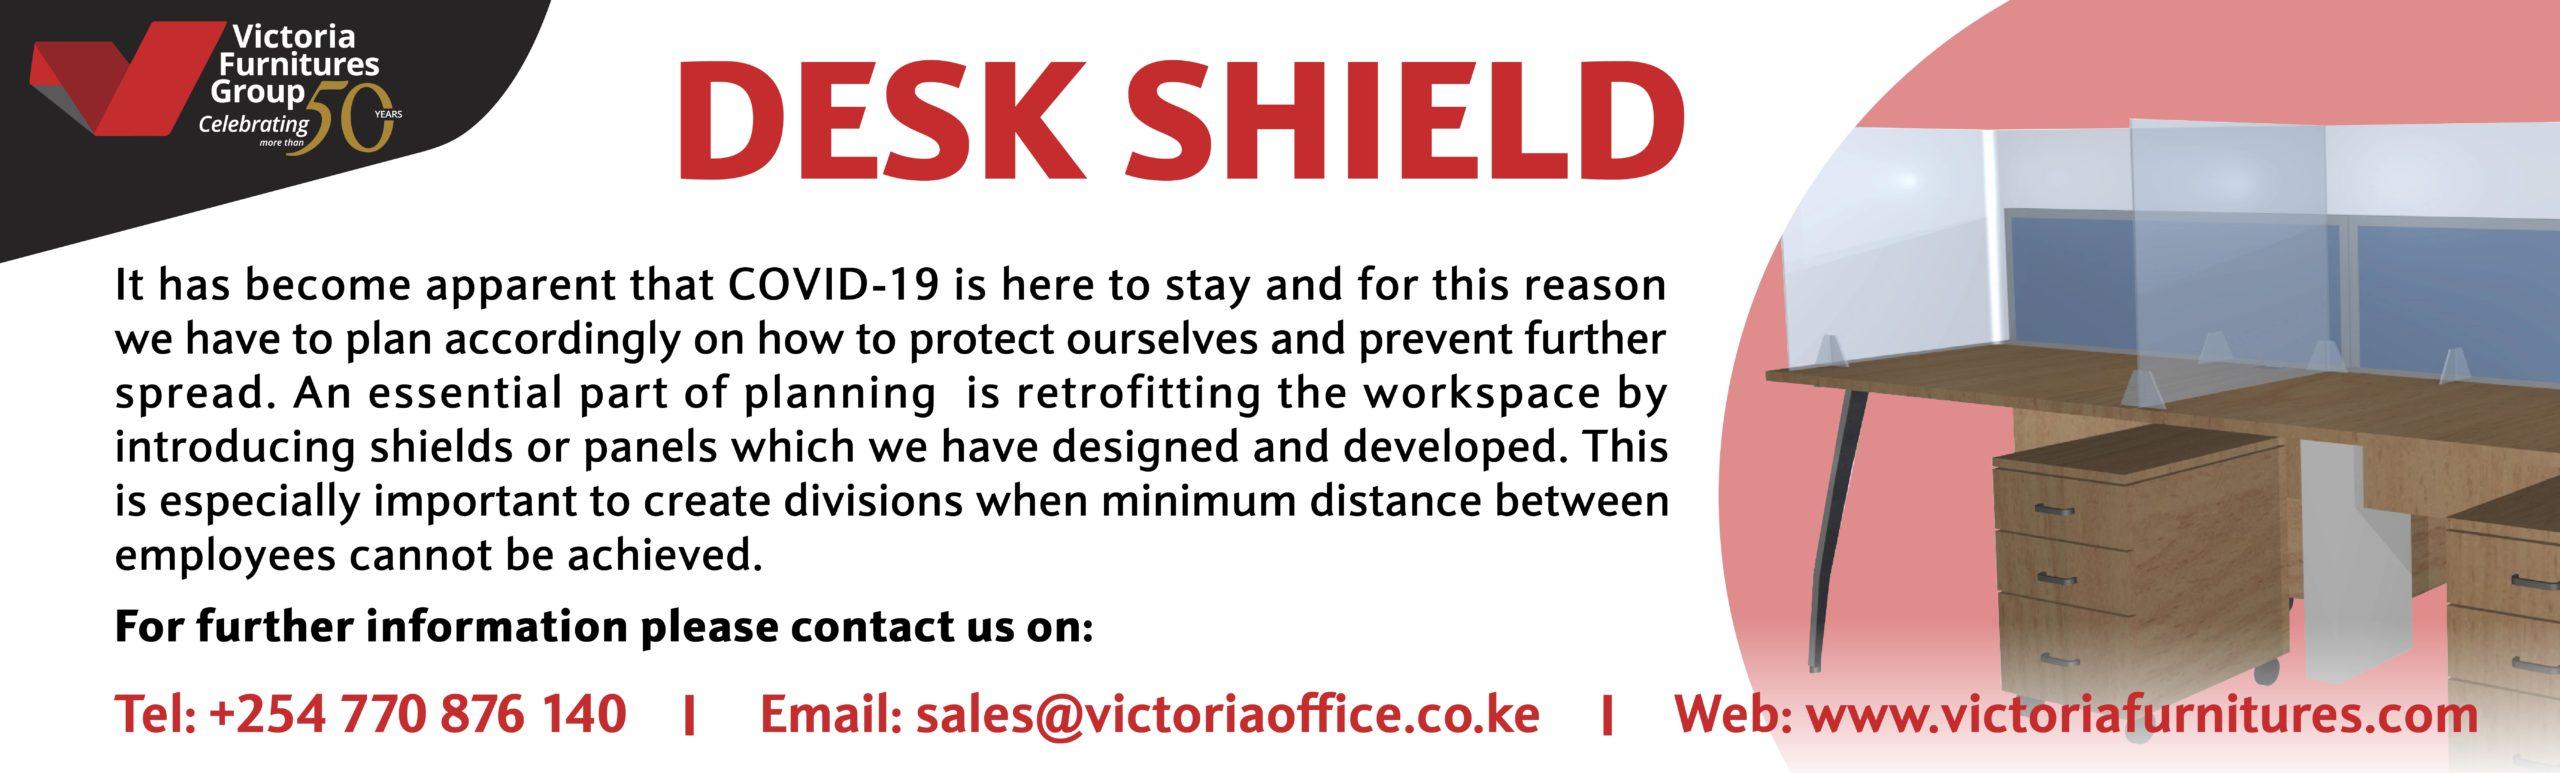 Desk Shield By Victoria Furnitures